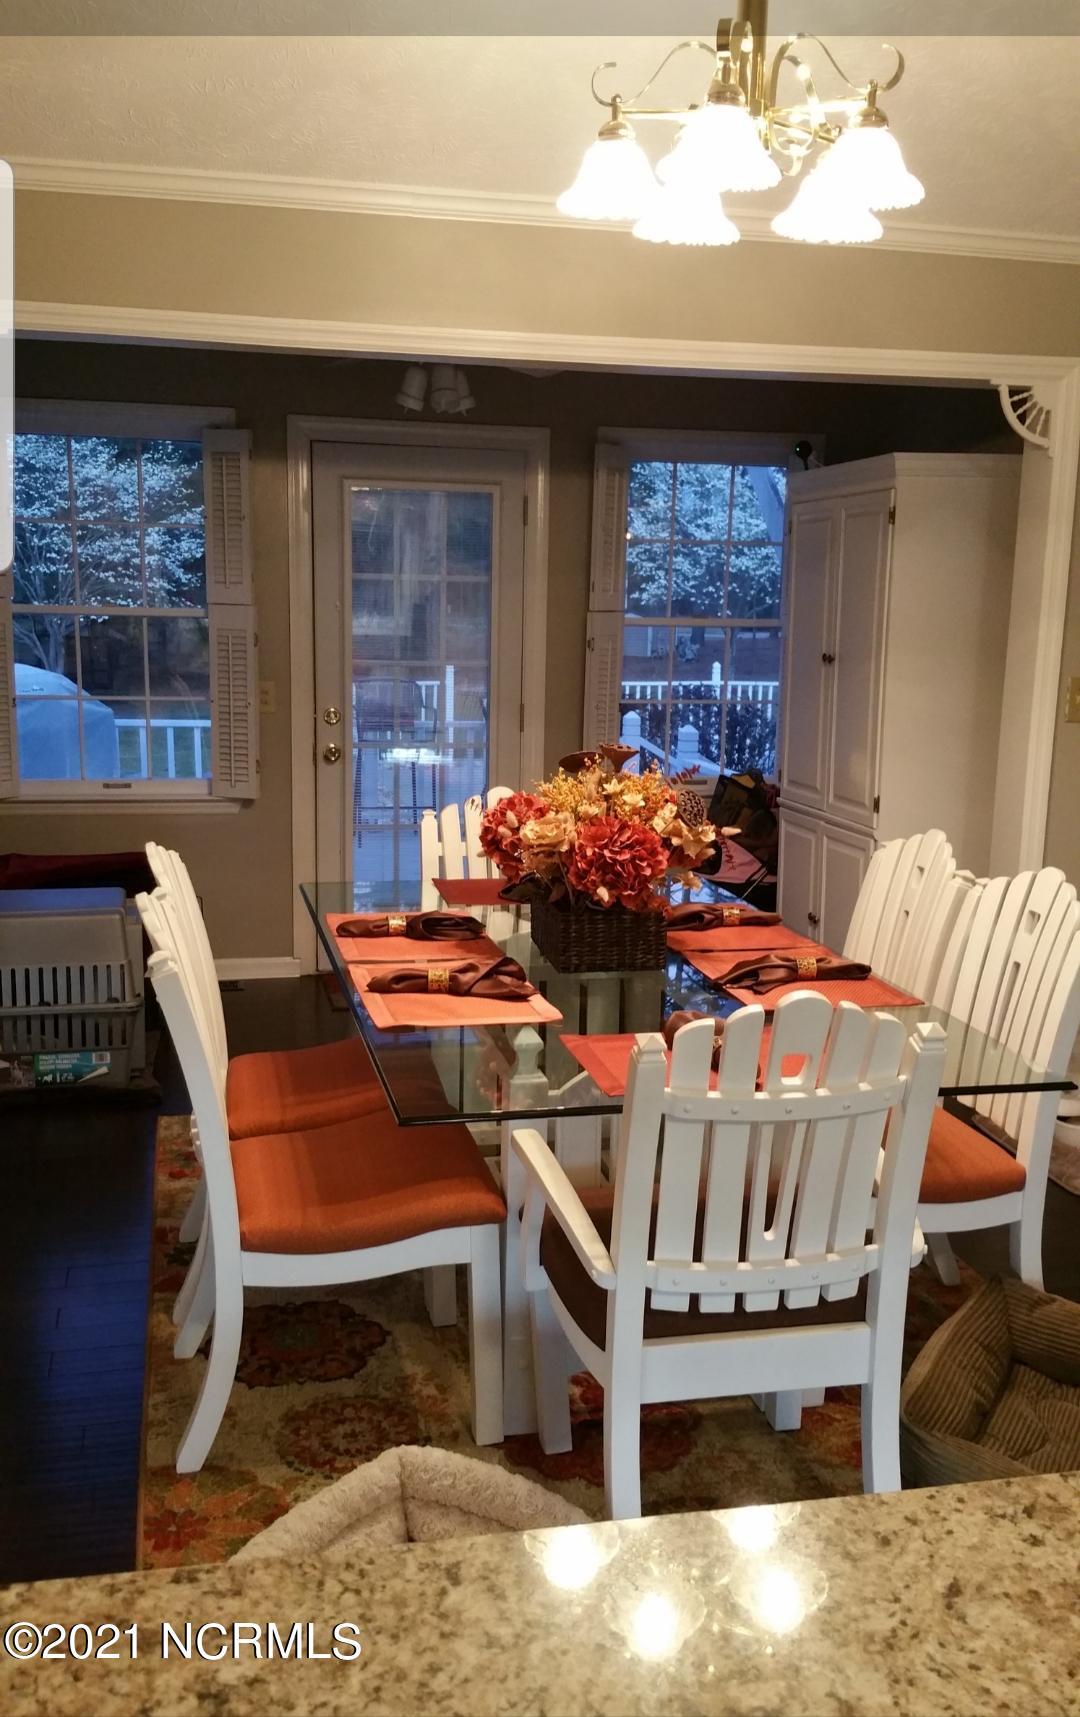 8061 Dornoch Circle, Laurinburg, North Carolina 28352, 4 Bedrooms Bedrooms, 7 Rooms Rooms,2 BathroomsBathrooms,Single family residence,For sale,Dornoch,100284305